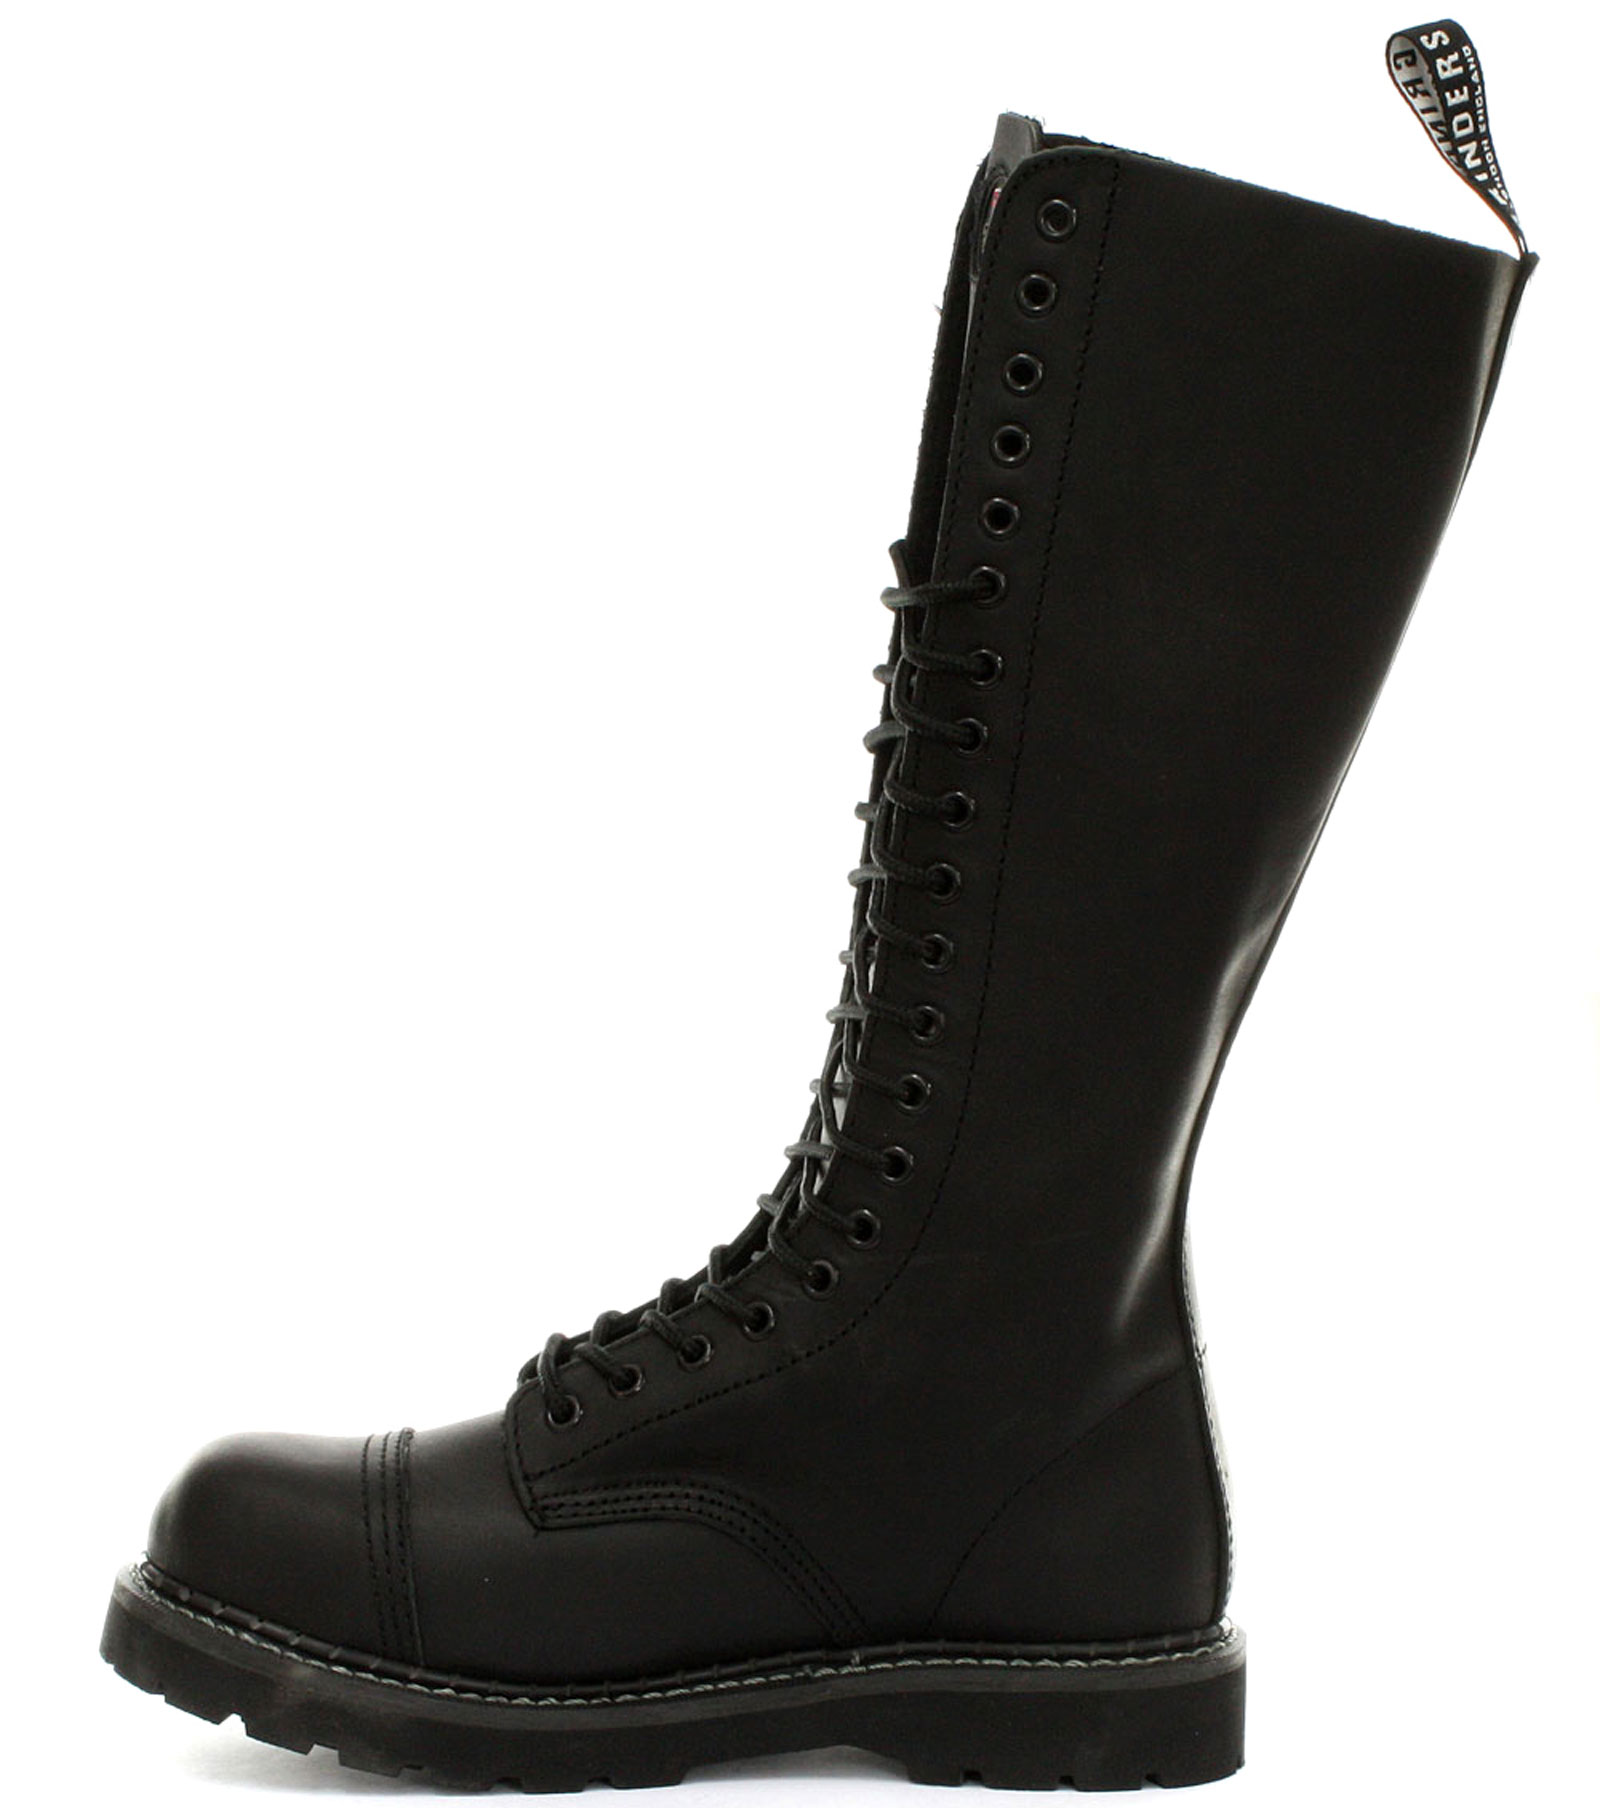 Model Caterpillar Boots Womenu0026#39;s 90448 Steel Toe Waterproof Black Dryverse Work Boots ...